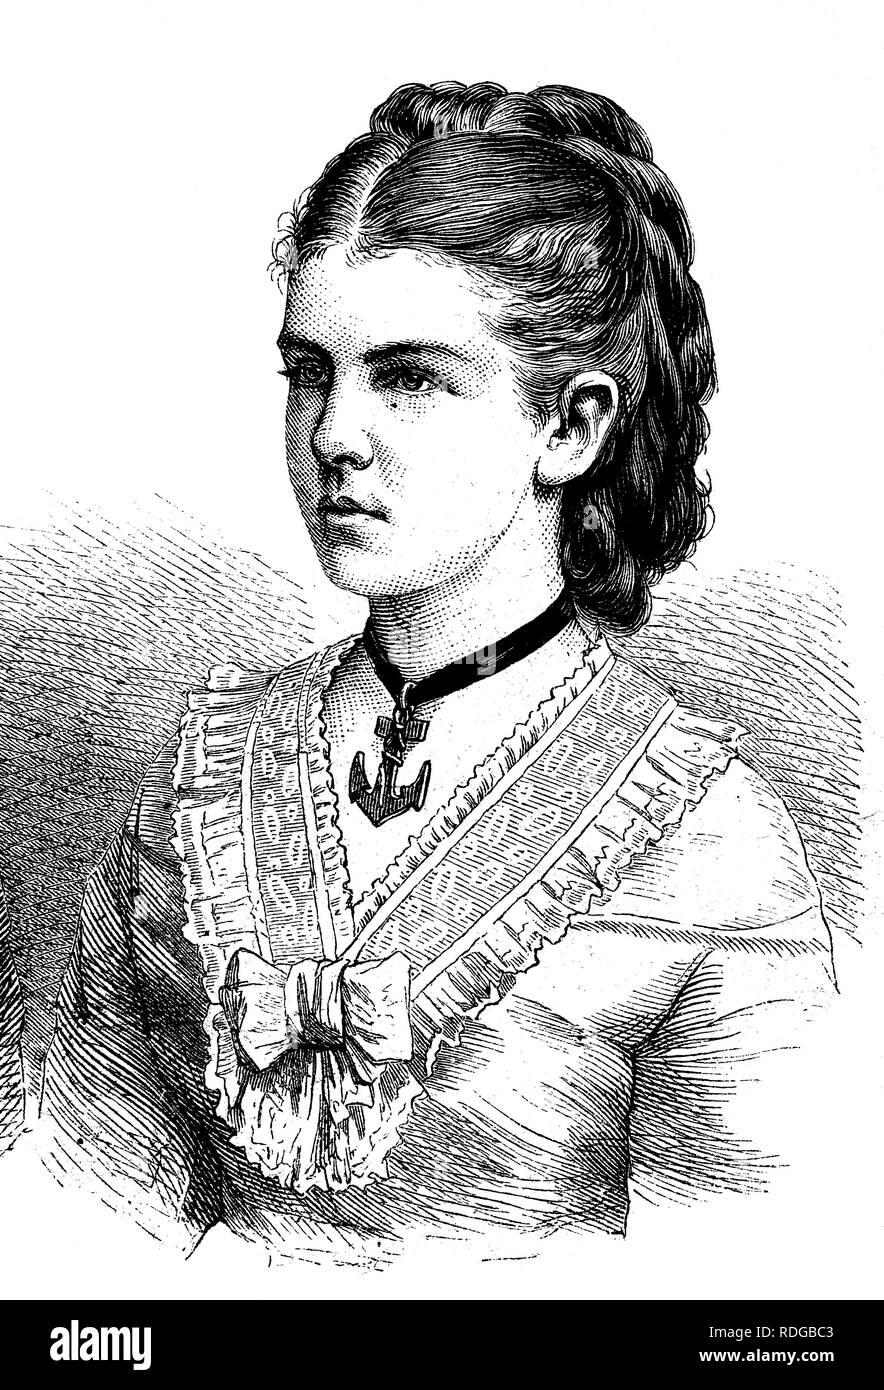 Princess Elizabeth Anna of Prussia, 1857 - 1895, wife of Grand Duke Friedrich August of Oldenburg, historical illustrati on Stock Photo